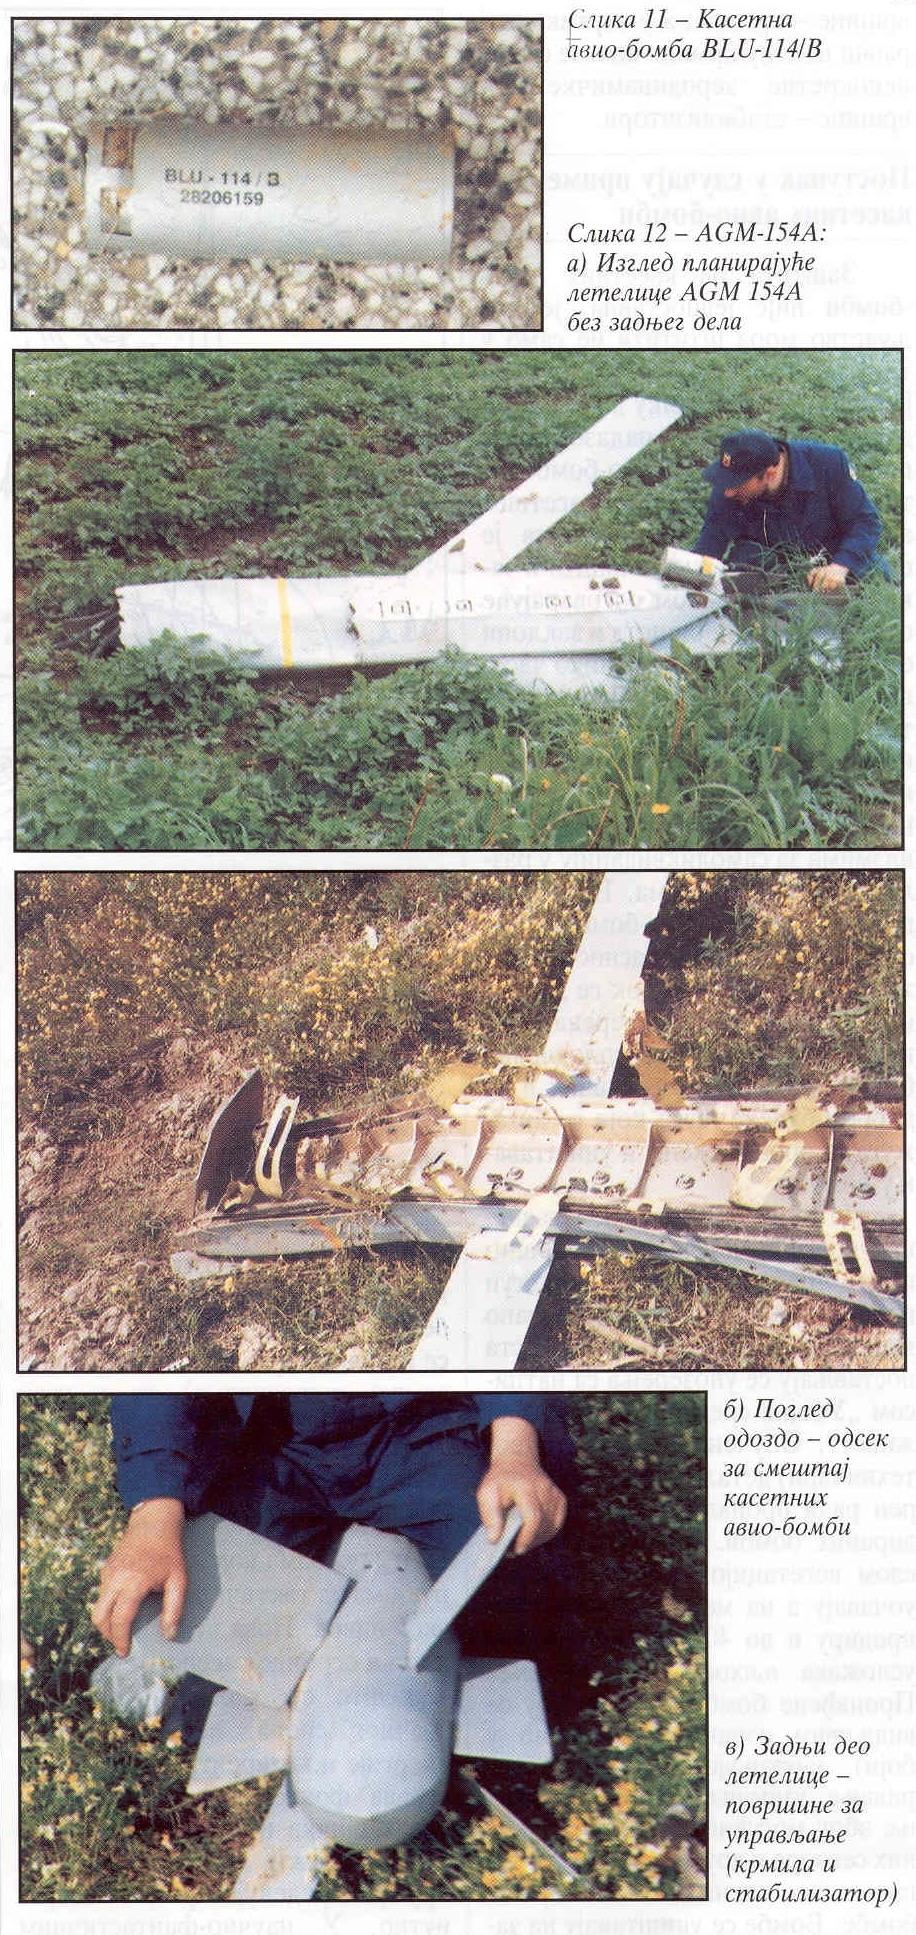 Slike NATO proektila.2